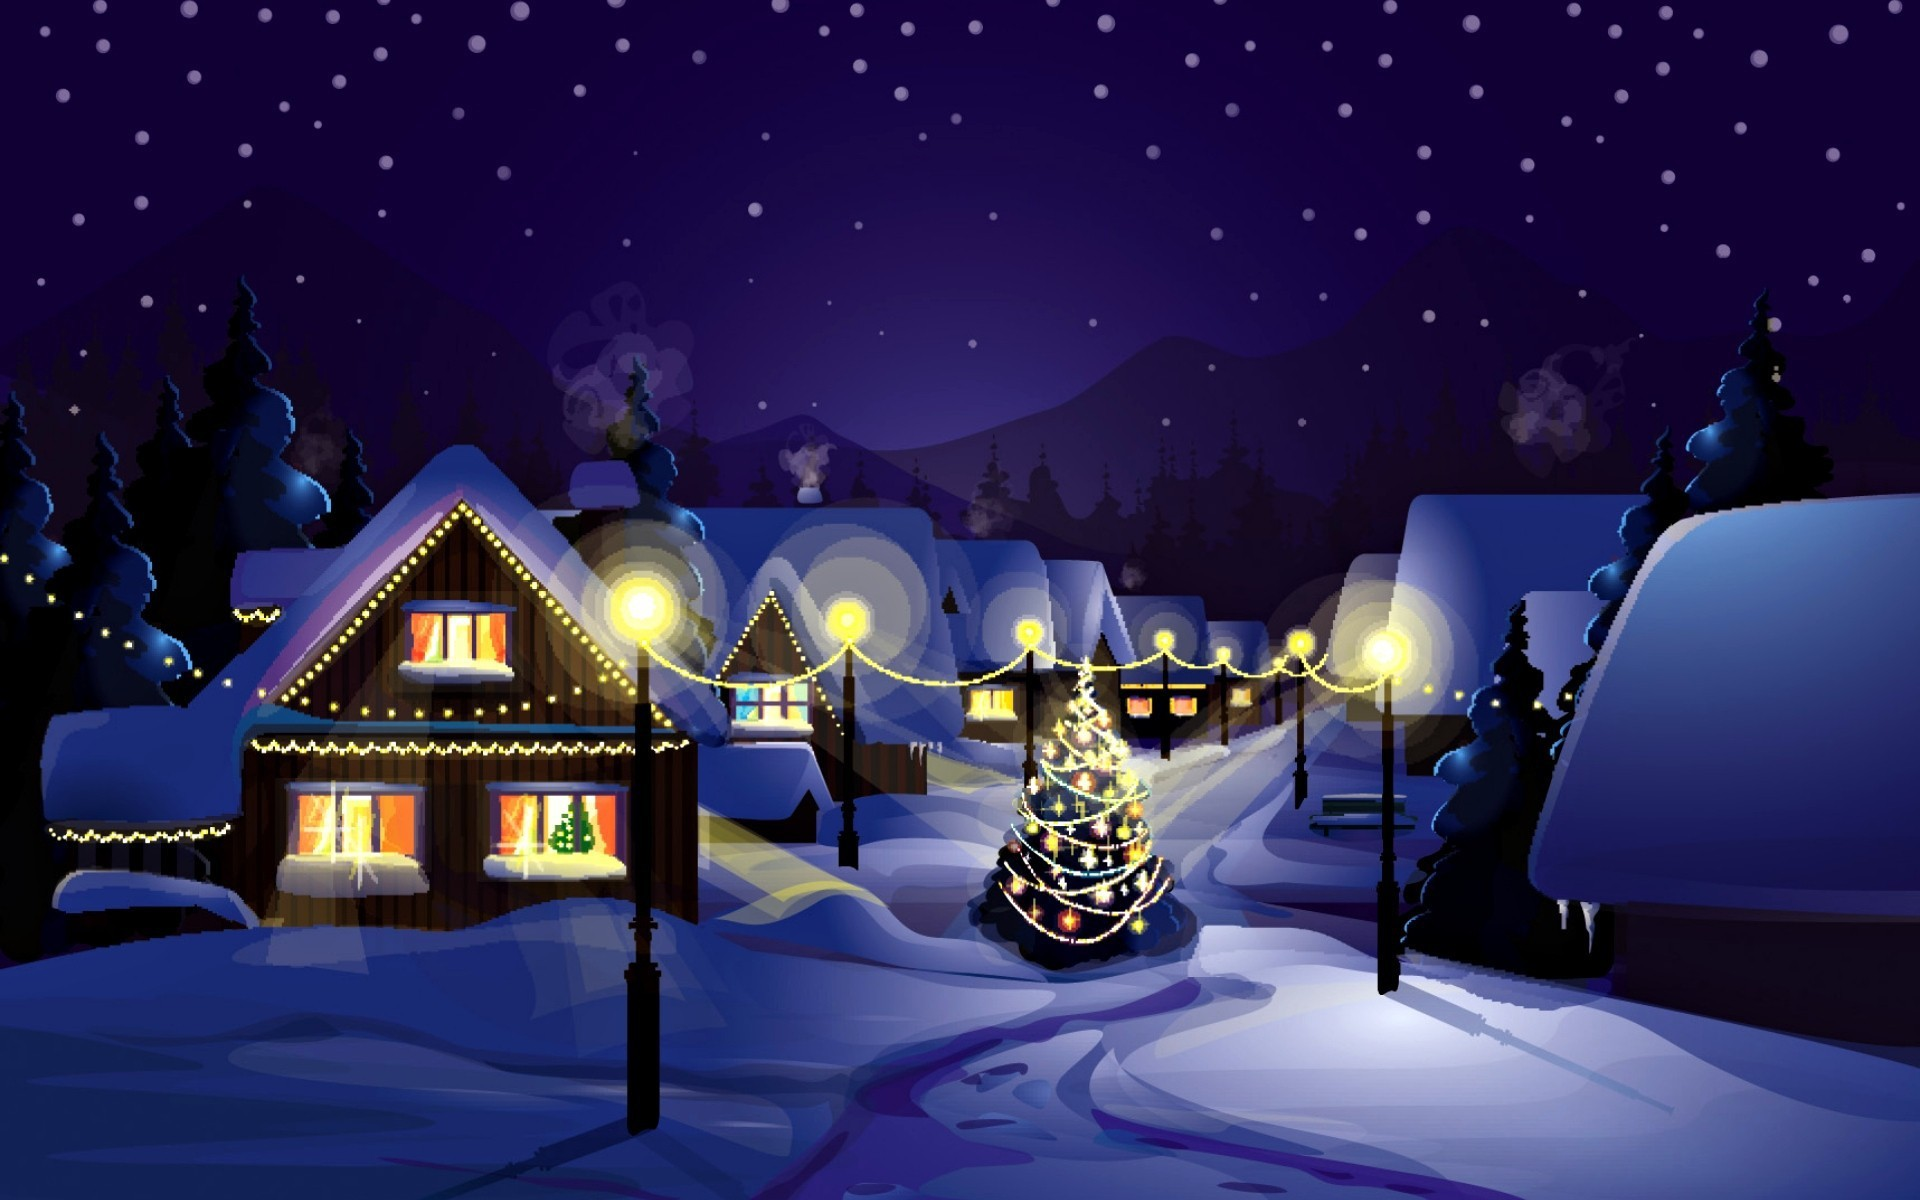 Animated Christmas Desktop Backgrounds.